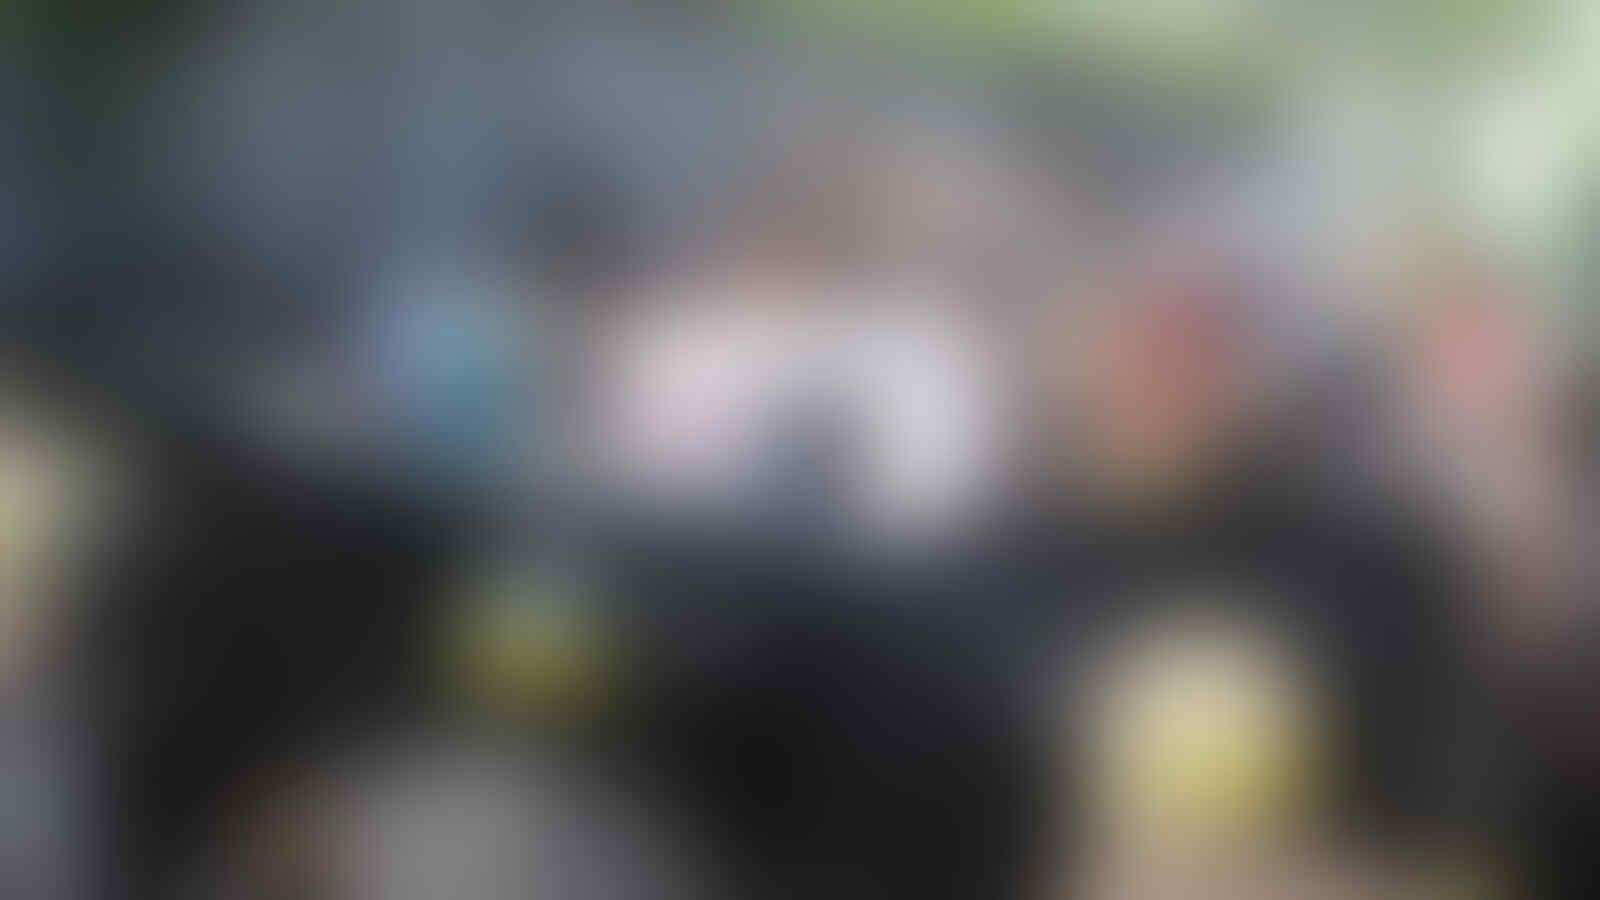 Tolak Eksekusi Lahan, Warga di Padang Blokade Jalan